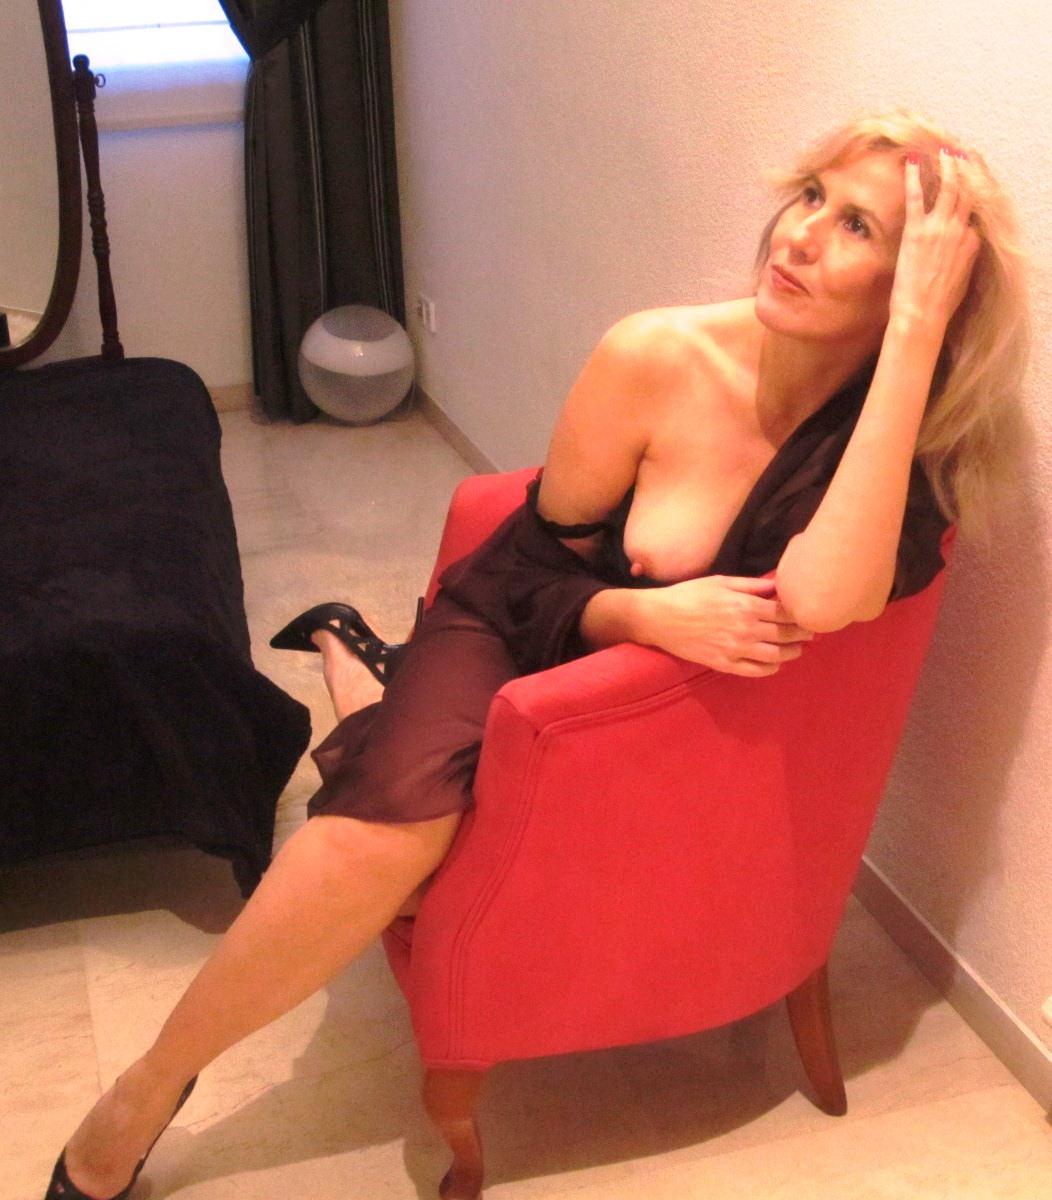 prostitutas por placer donde hay prostitutas en pontevedra